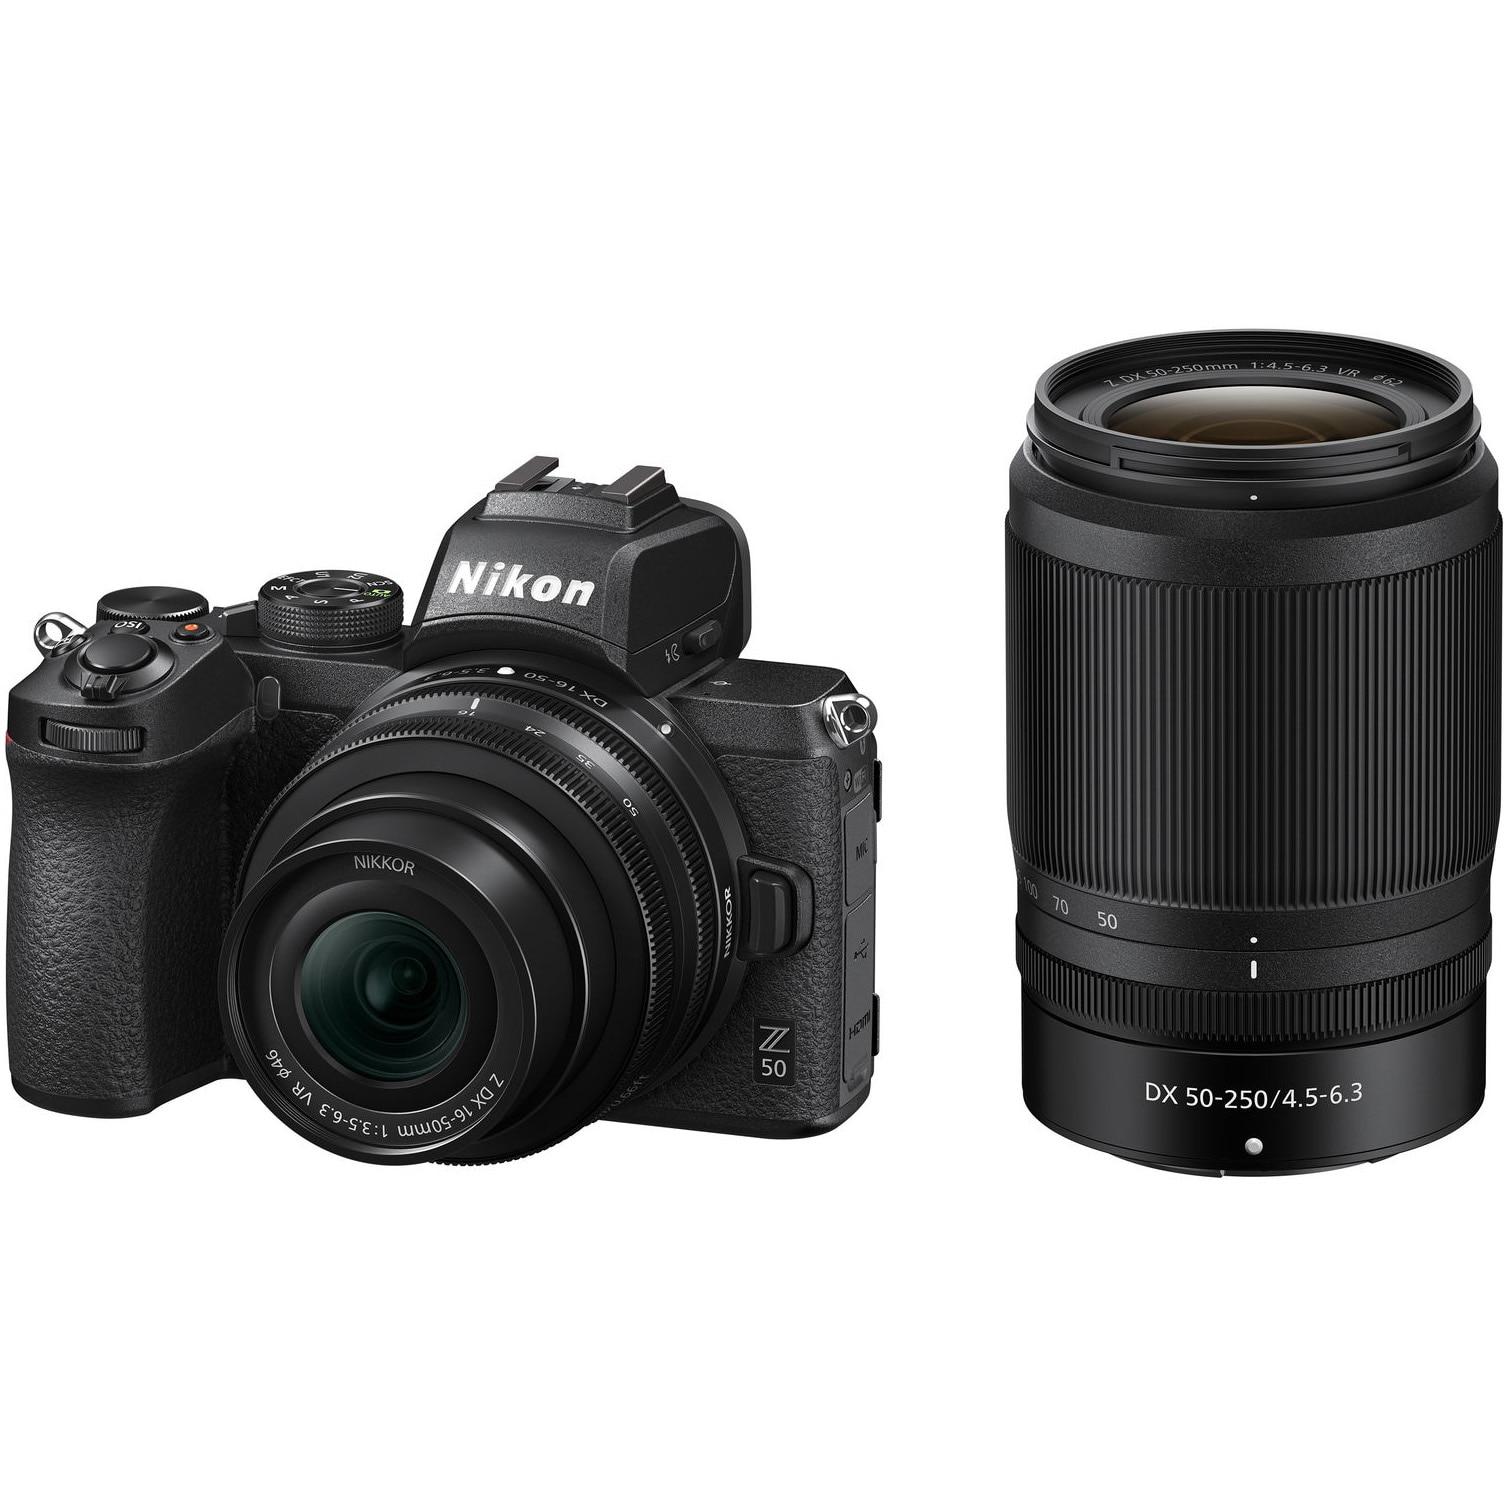 Fotografie Aparat foto Mirrorless Nikon Z50, 20.9 MP , 4K , Wi-Fi + Obiectiv 16-50mm + Obiectiv 50-250mm, Negru